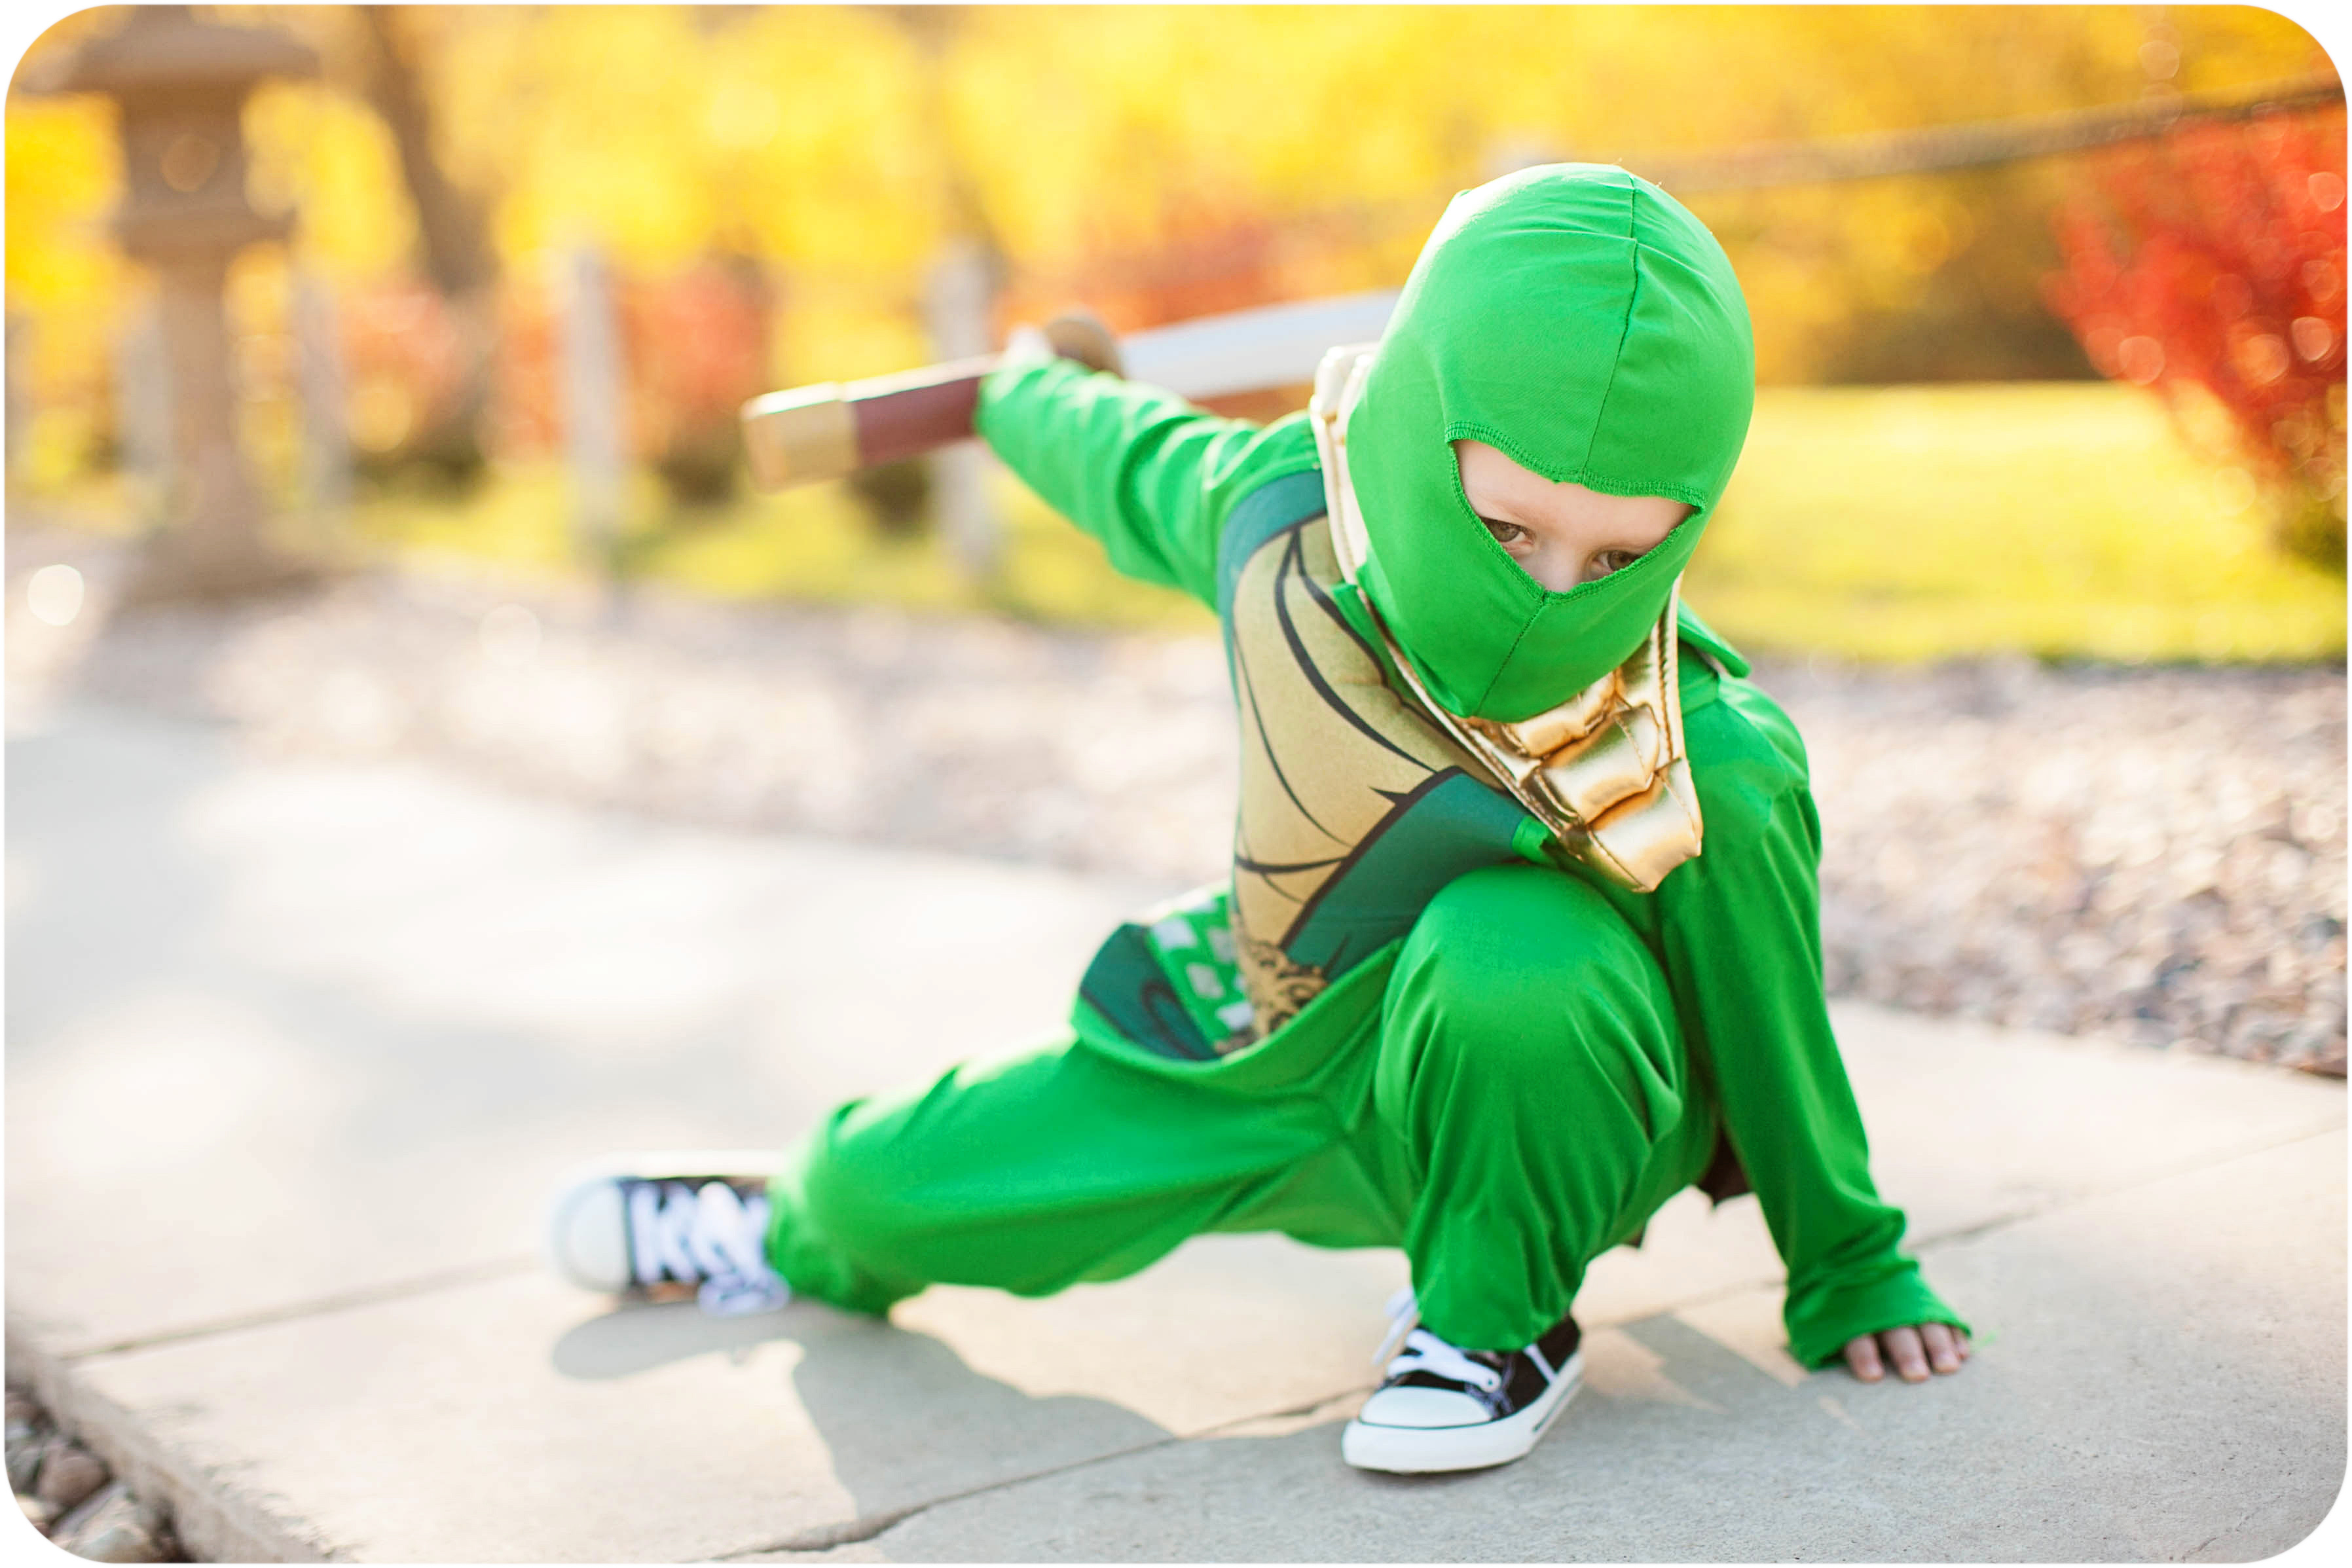 Ninja_02.jpg